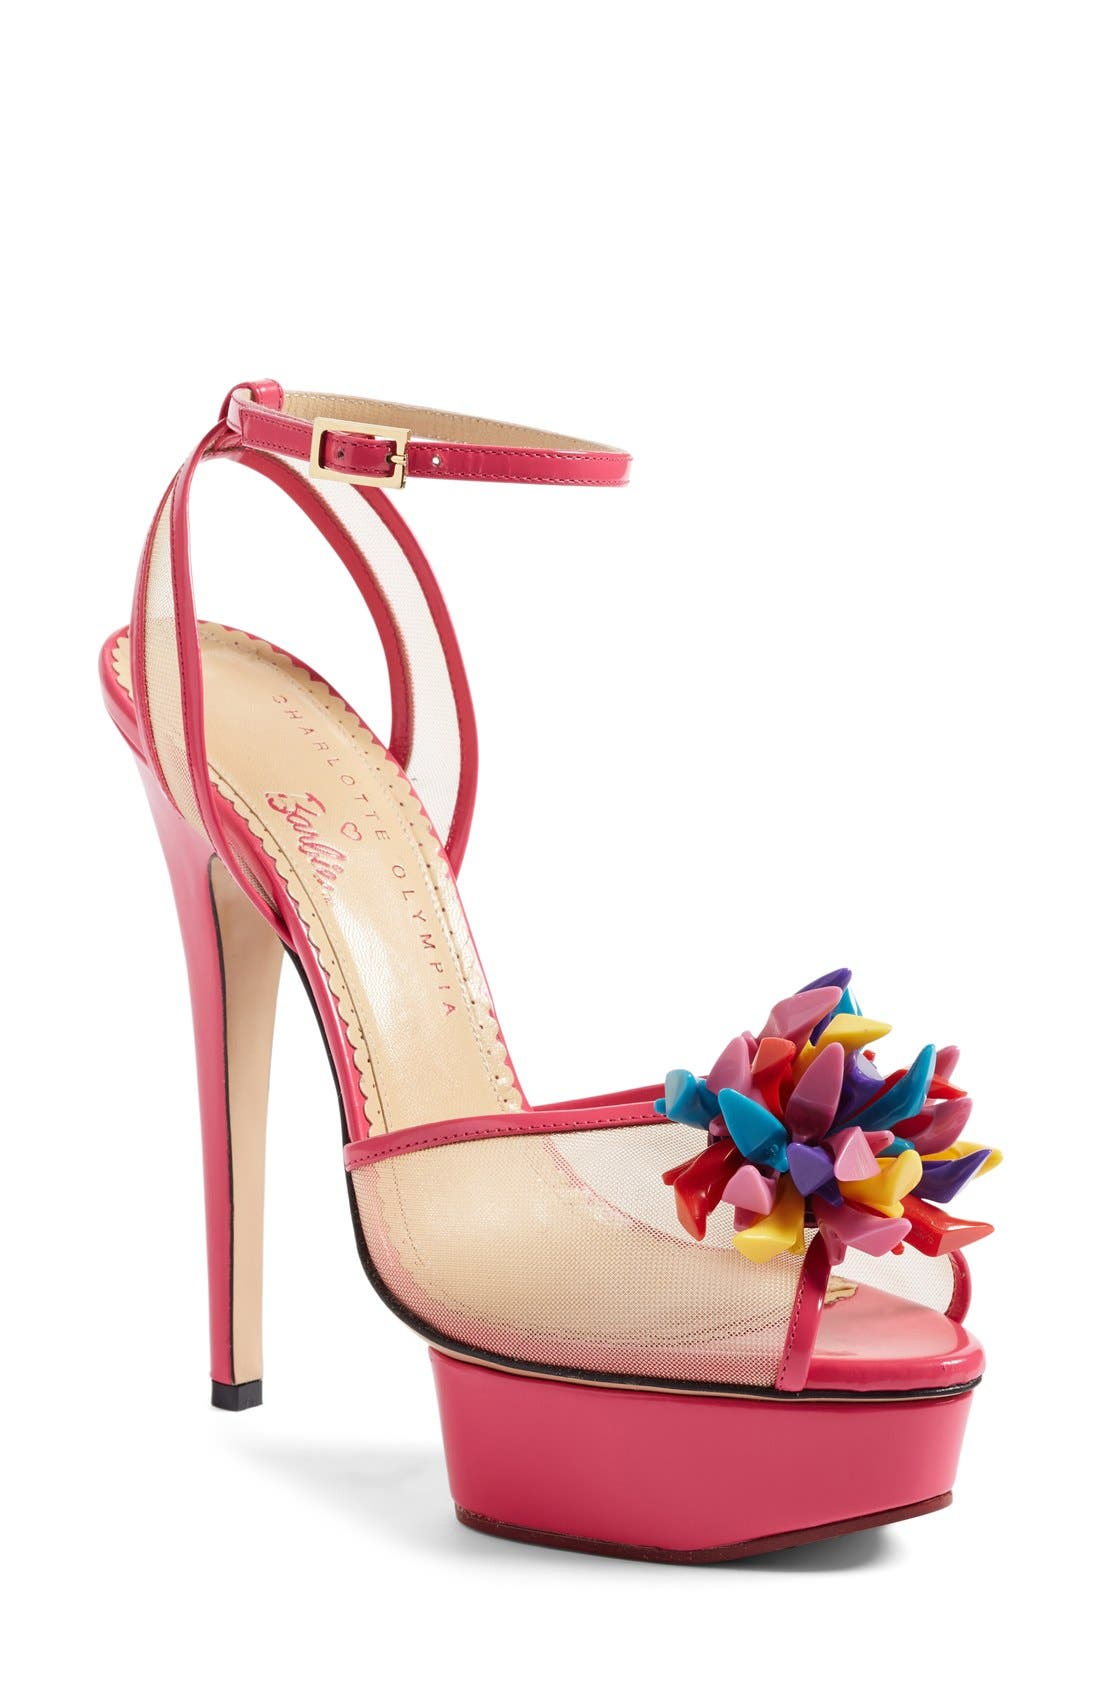 Main Image - Charlotte Olympia x Barbie® Pomeline Peep Toe Sandal (Women)